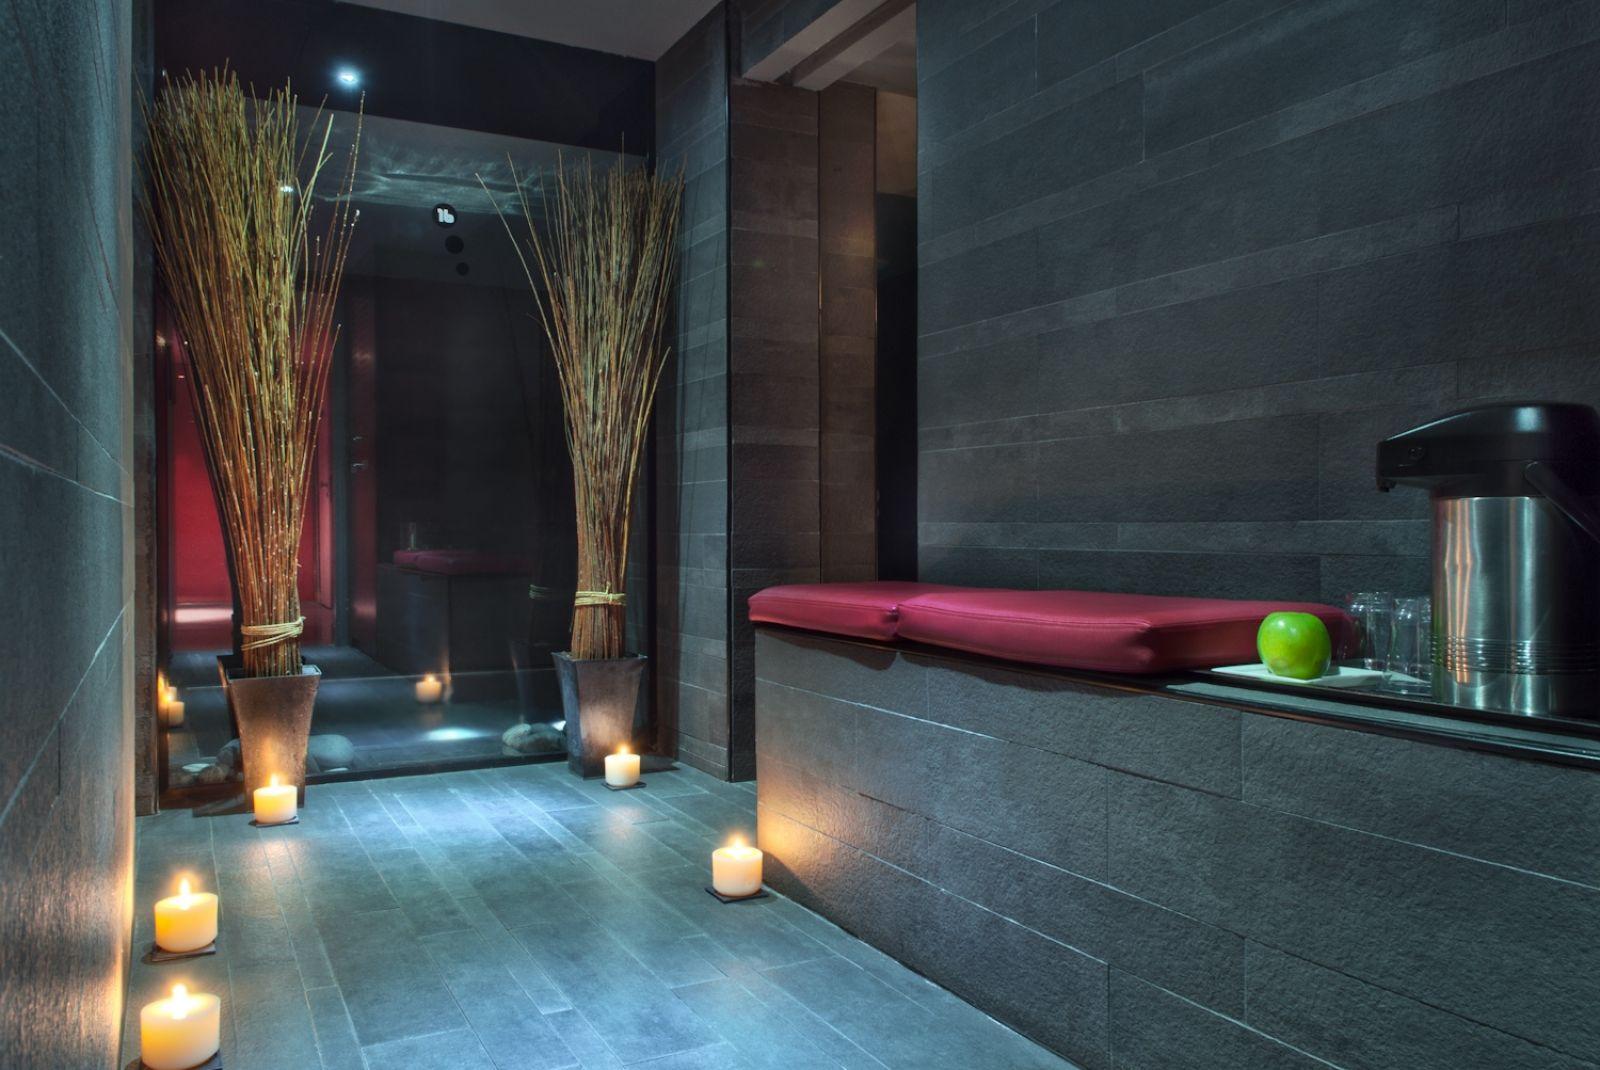 Hotel sezz paris emporium travel luxushotels luxusreisen for Hotel spa paris couple